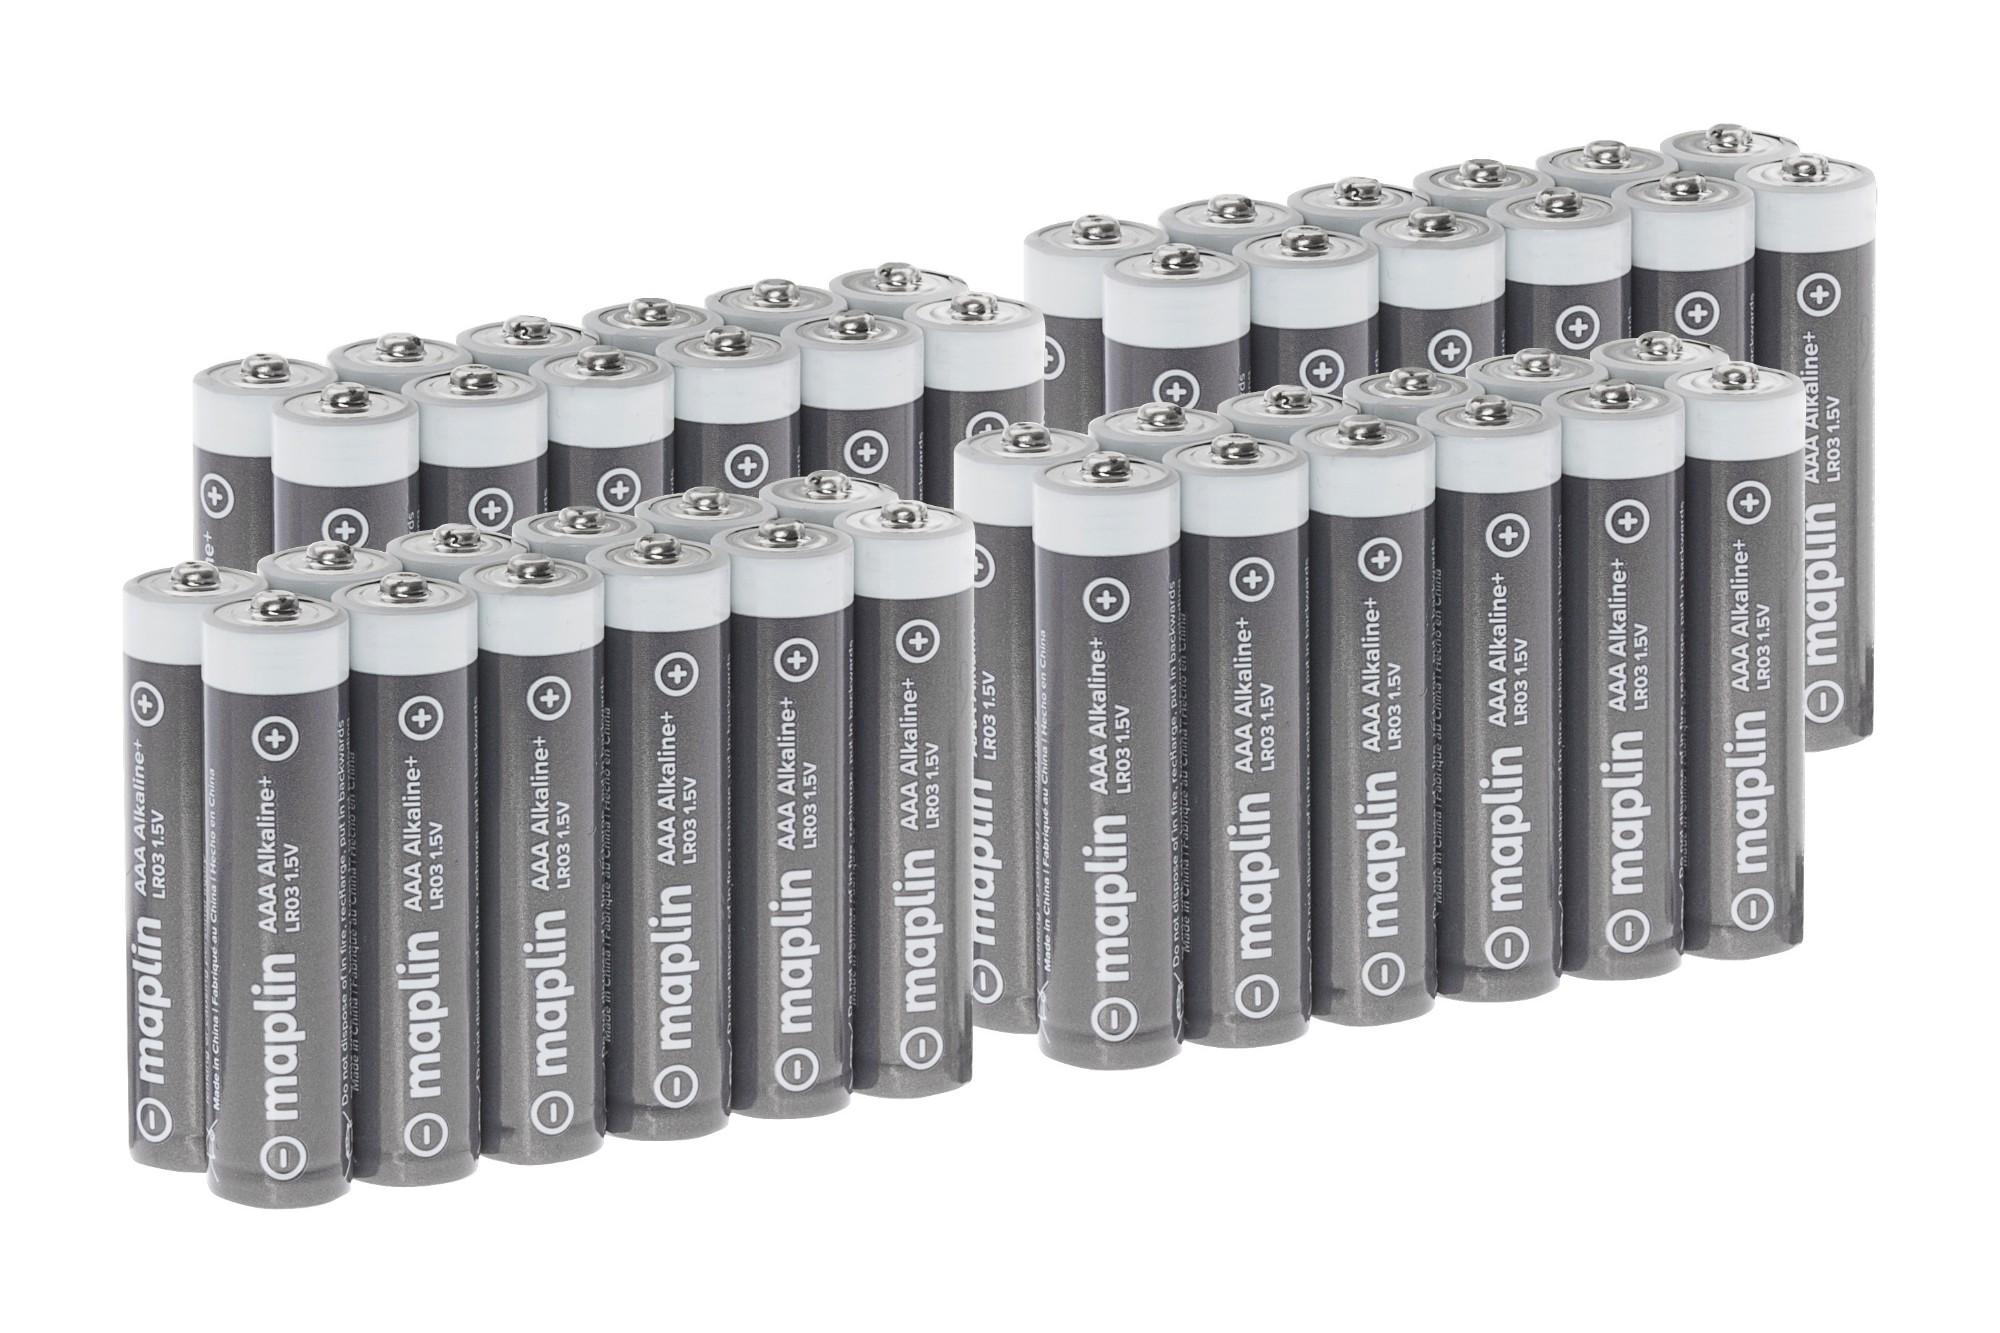 MAPLIN Extra Long Life High Performance Alkaline AAA Batteries - Pack of 48 (4 x 12)